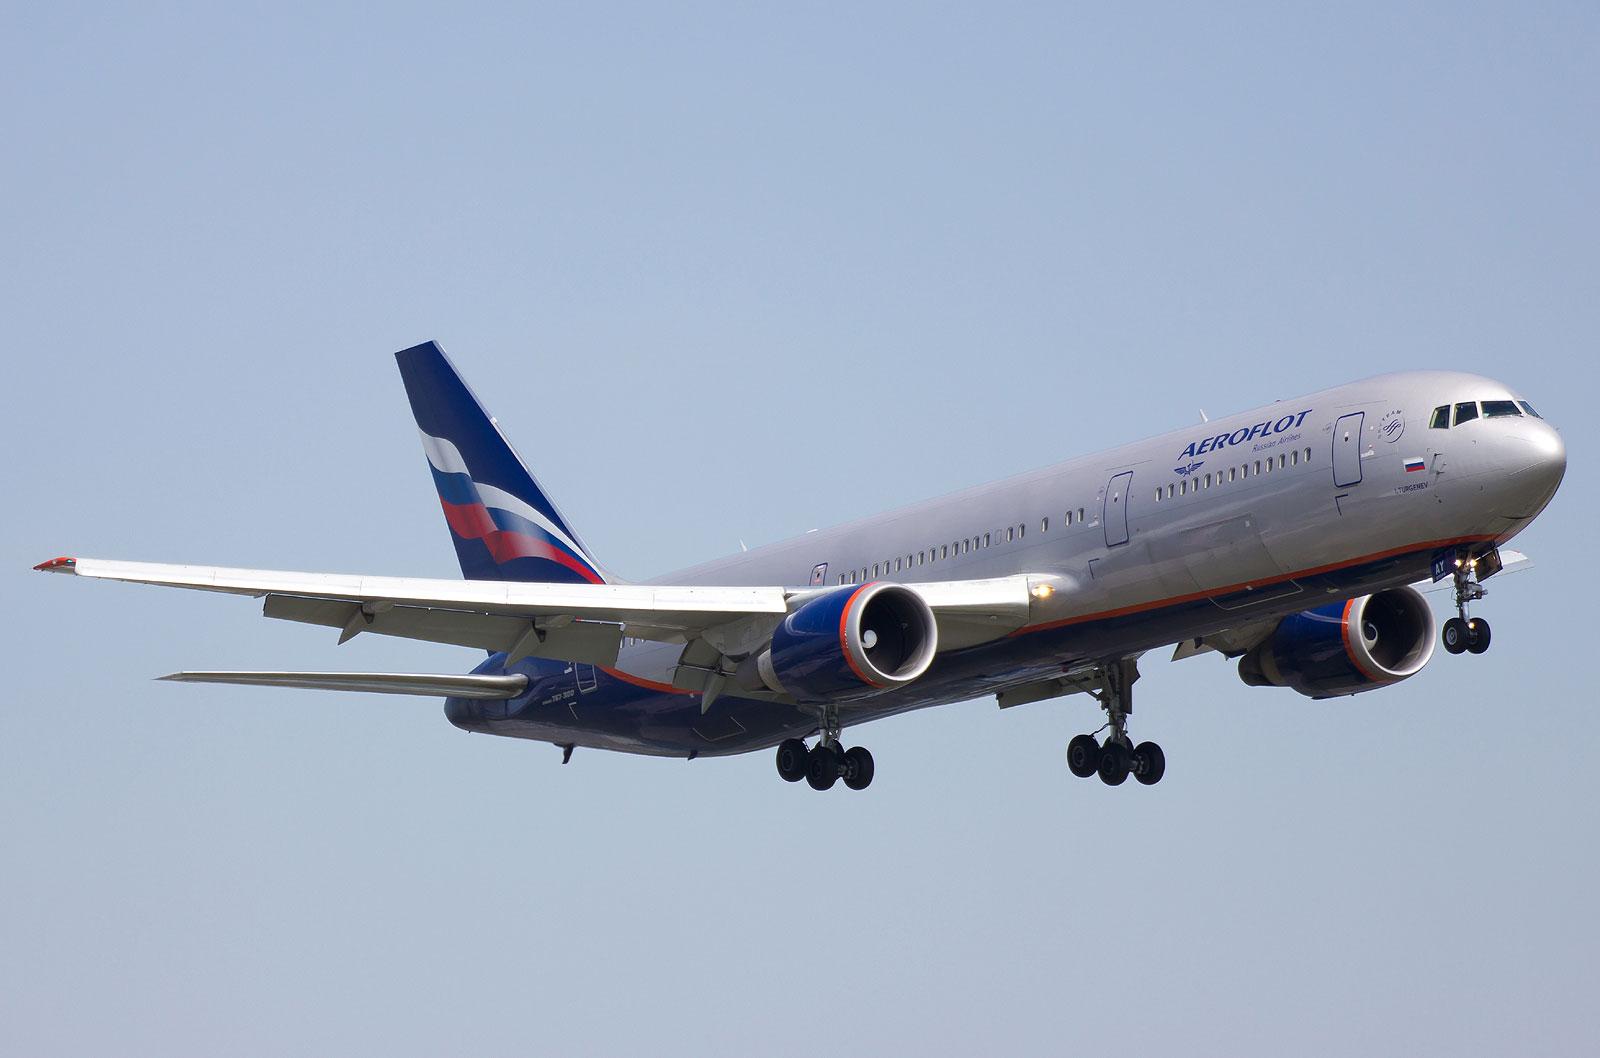 Boeing 767-300 (Боинг 767-300) - Аэрофлот. Фото, видео и описание ...